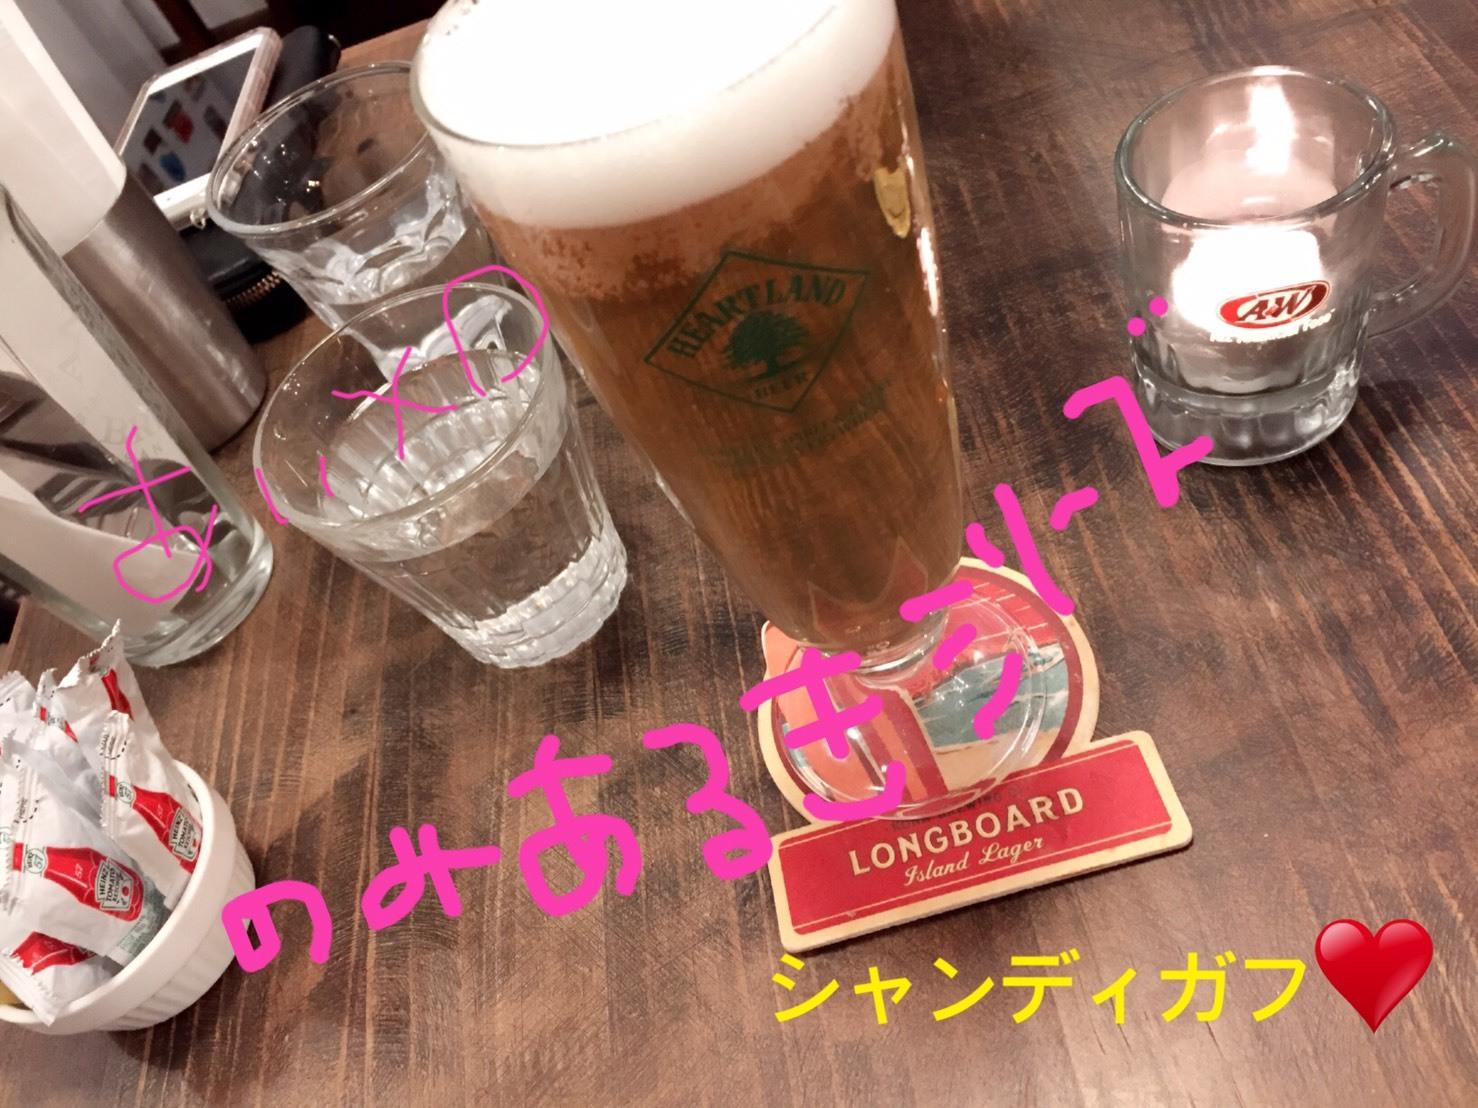 S__15204468.jpg